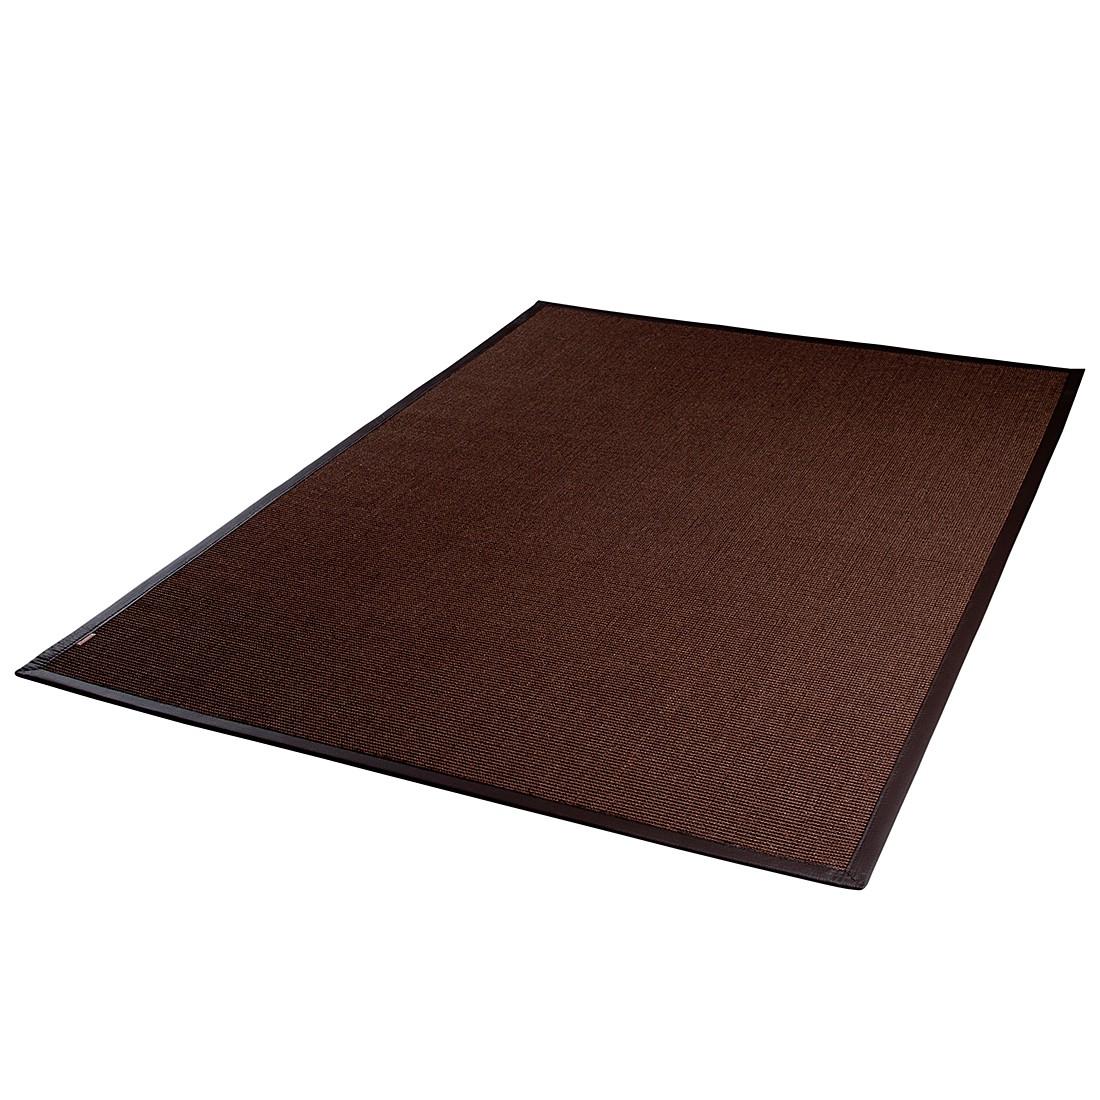 Teppich Mara A1 – Mokka – 133 x 190 cm, DEKOWE online kaufen